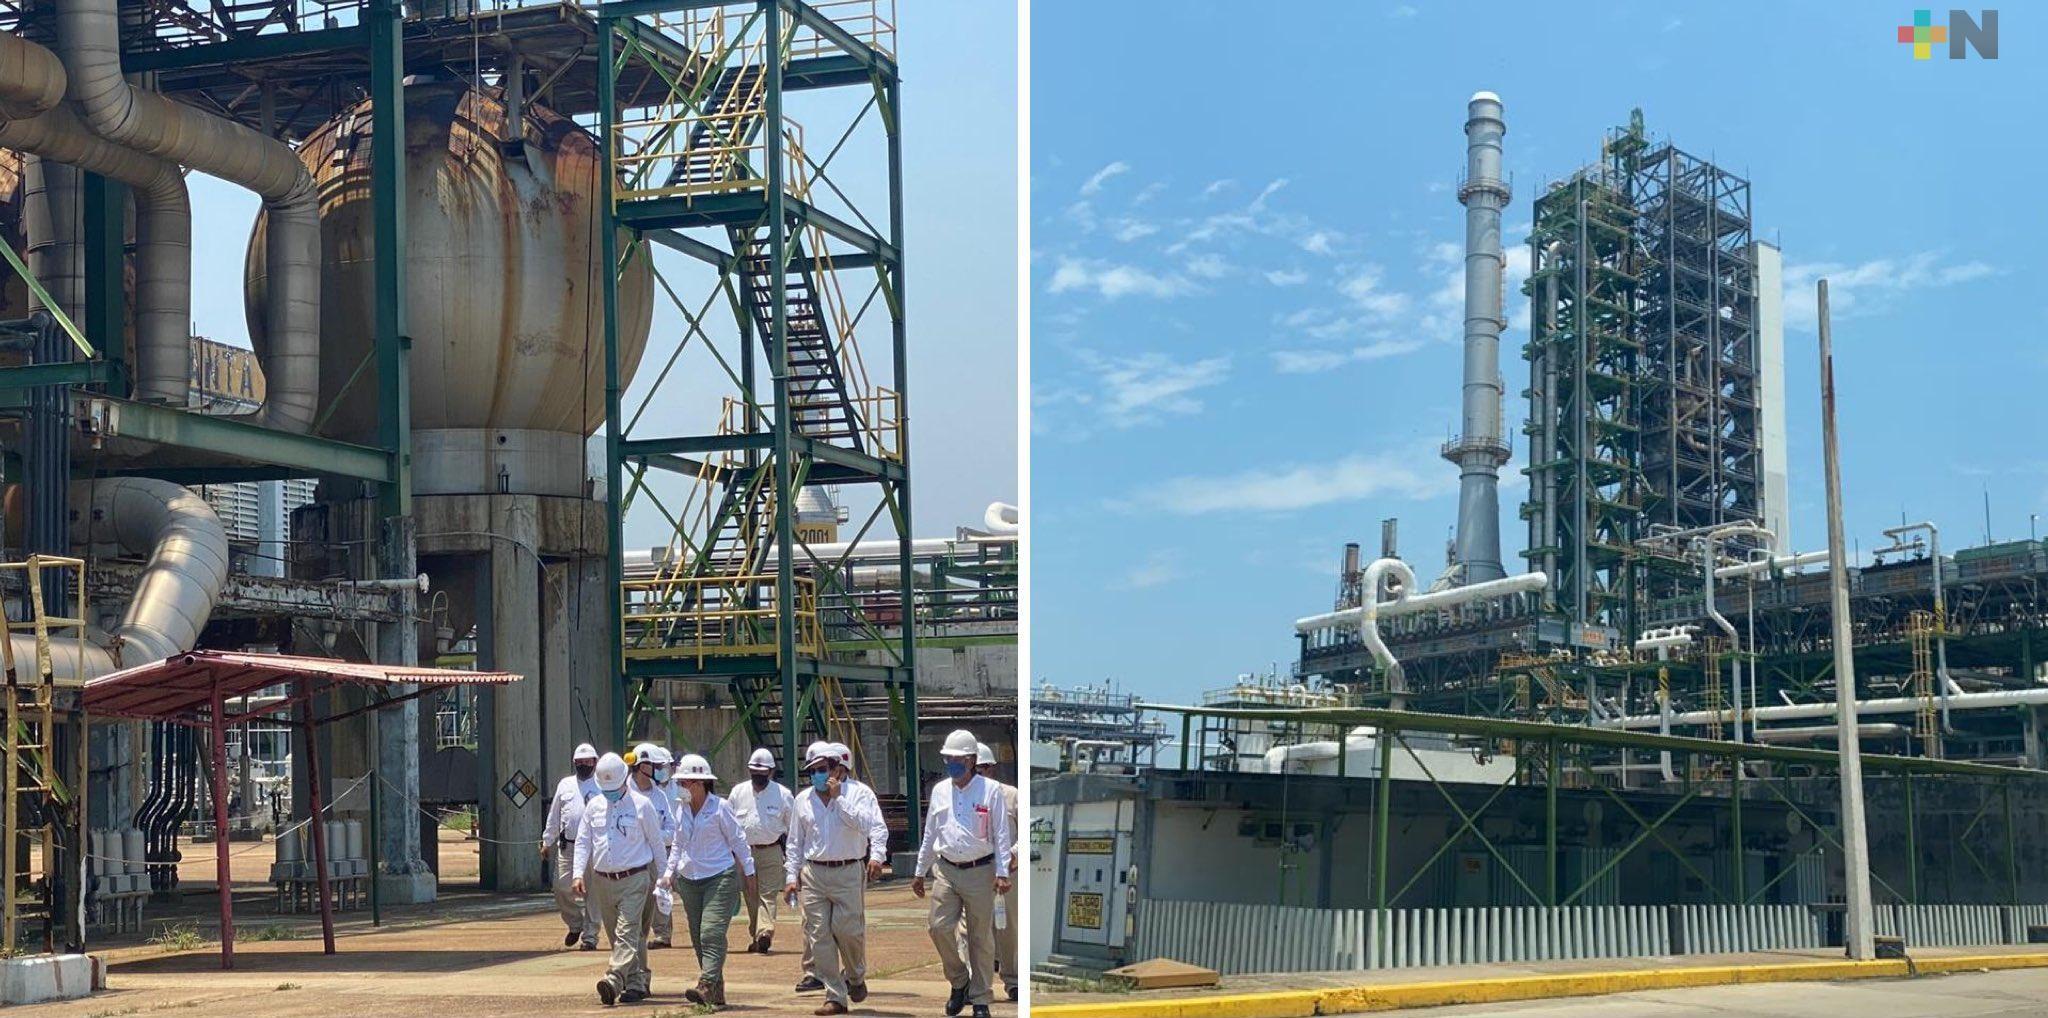 Tren de Refinación garantizará autosuficiencia de combustibles, reitera Rocío Nahle